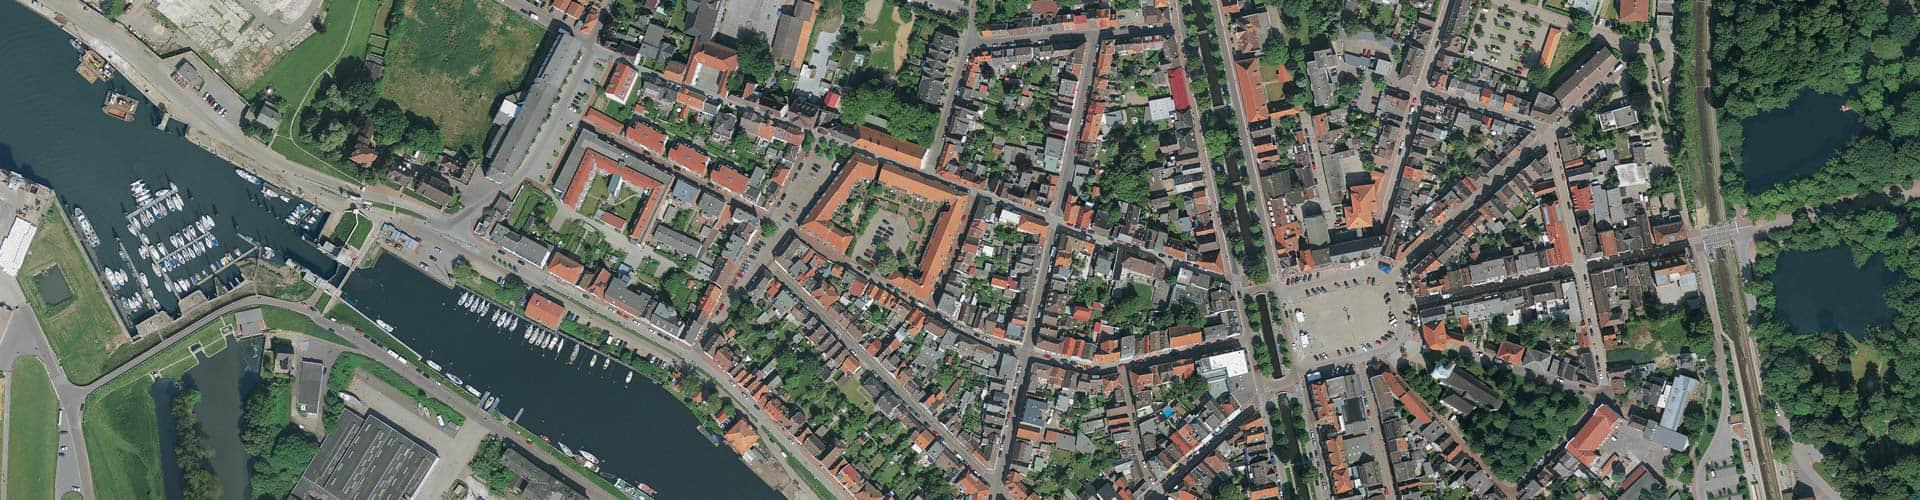 Stadtdenkmal Glückstadt – Stadtansicht